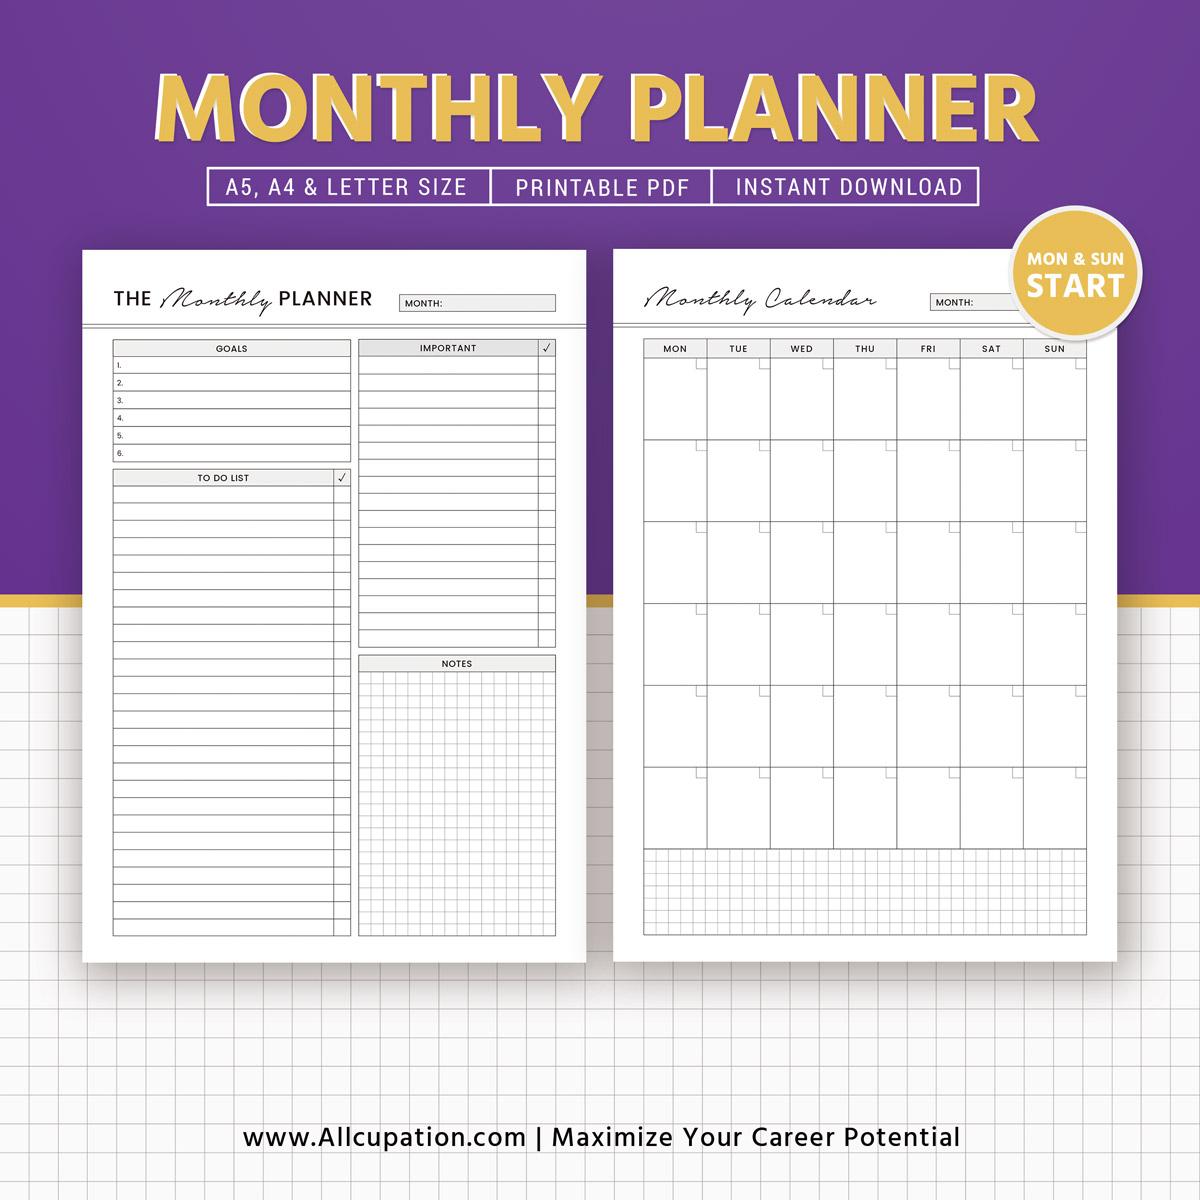 Calendar Monthly Planner : Monthly planner calendar a